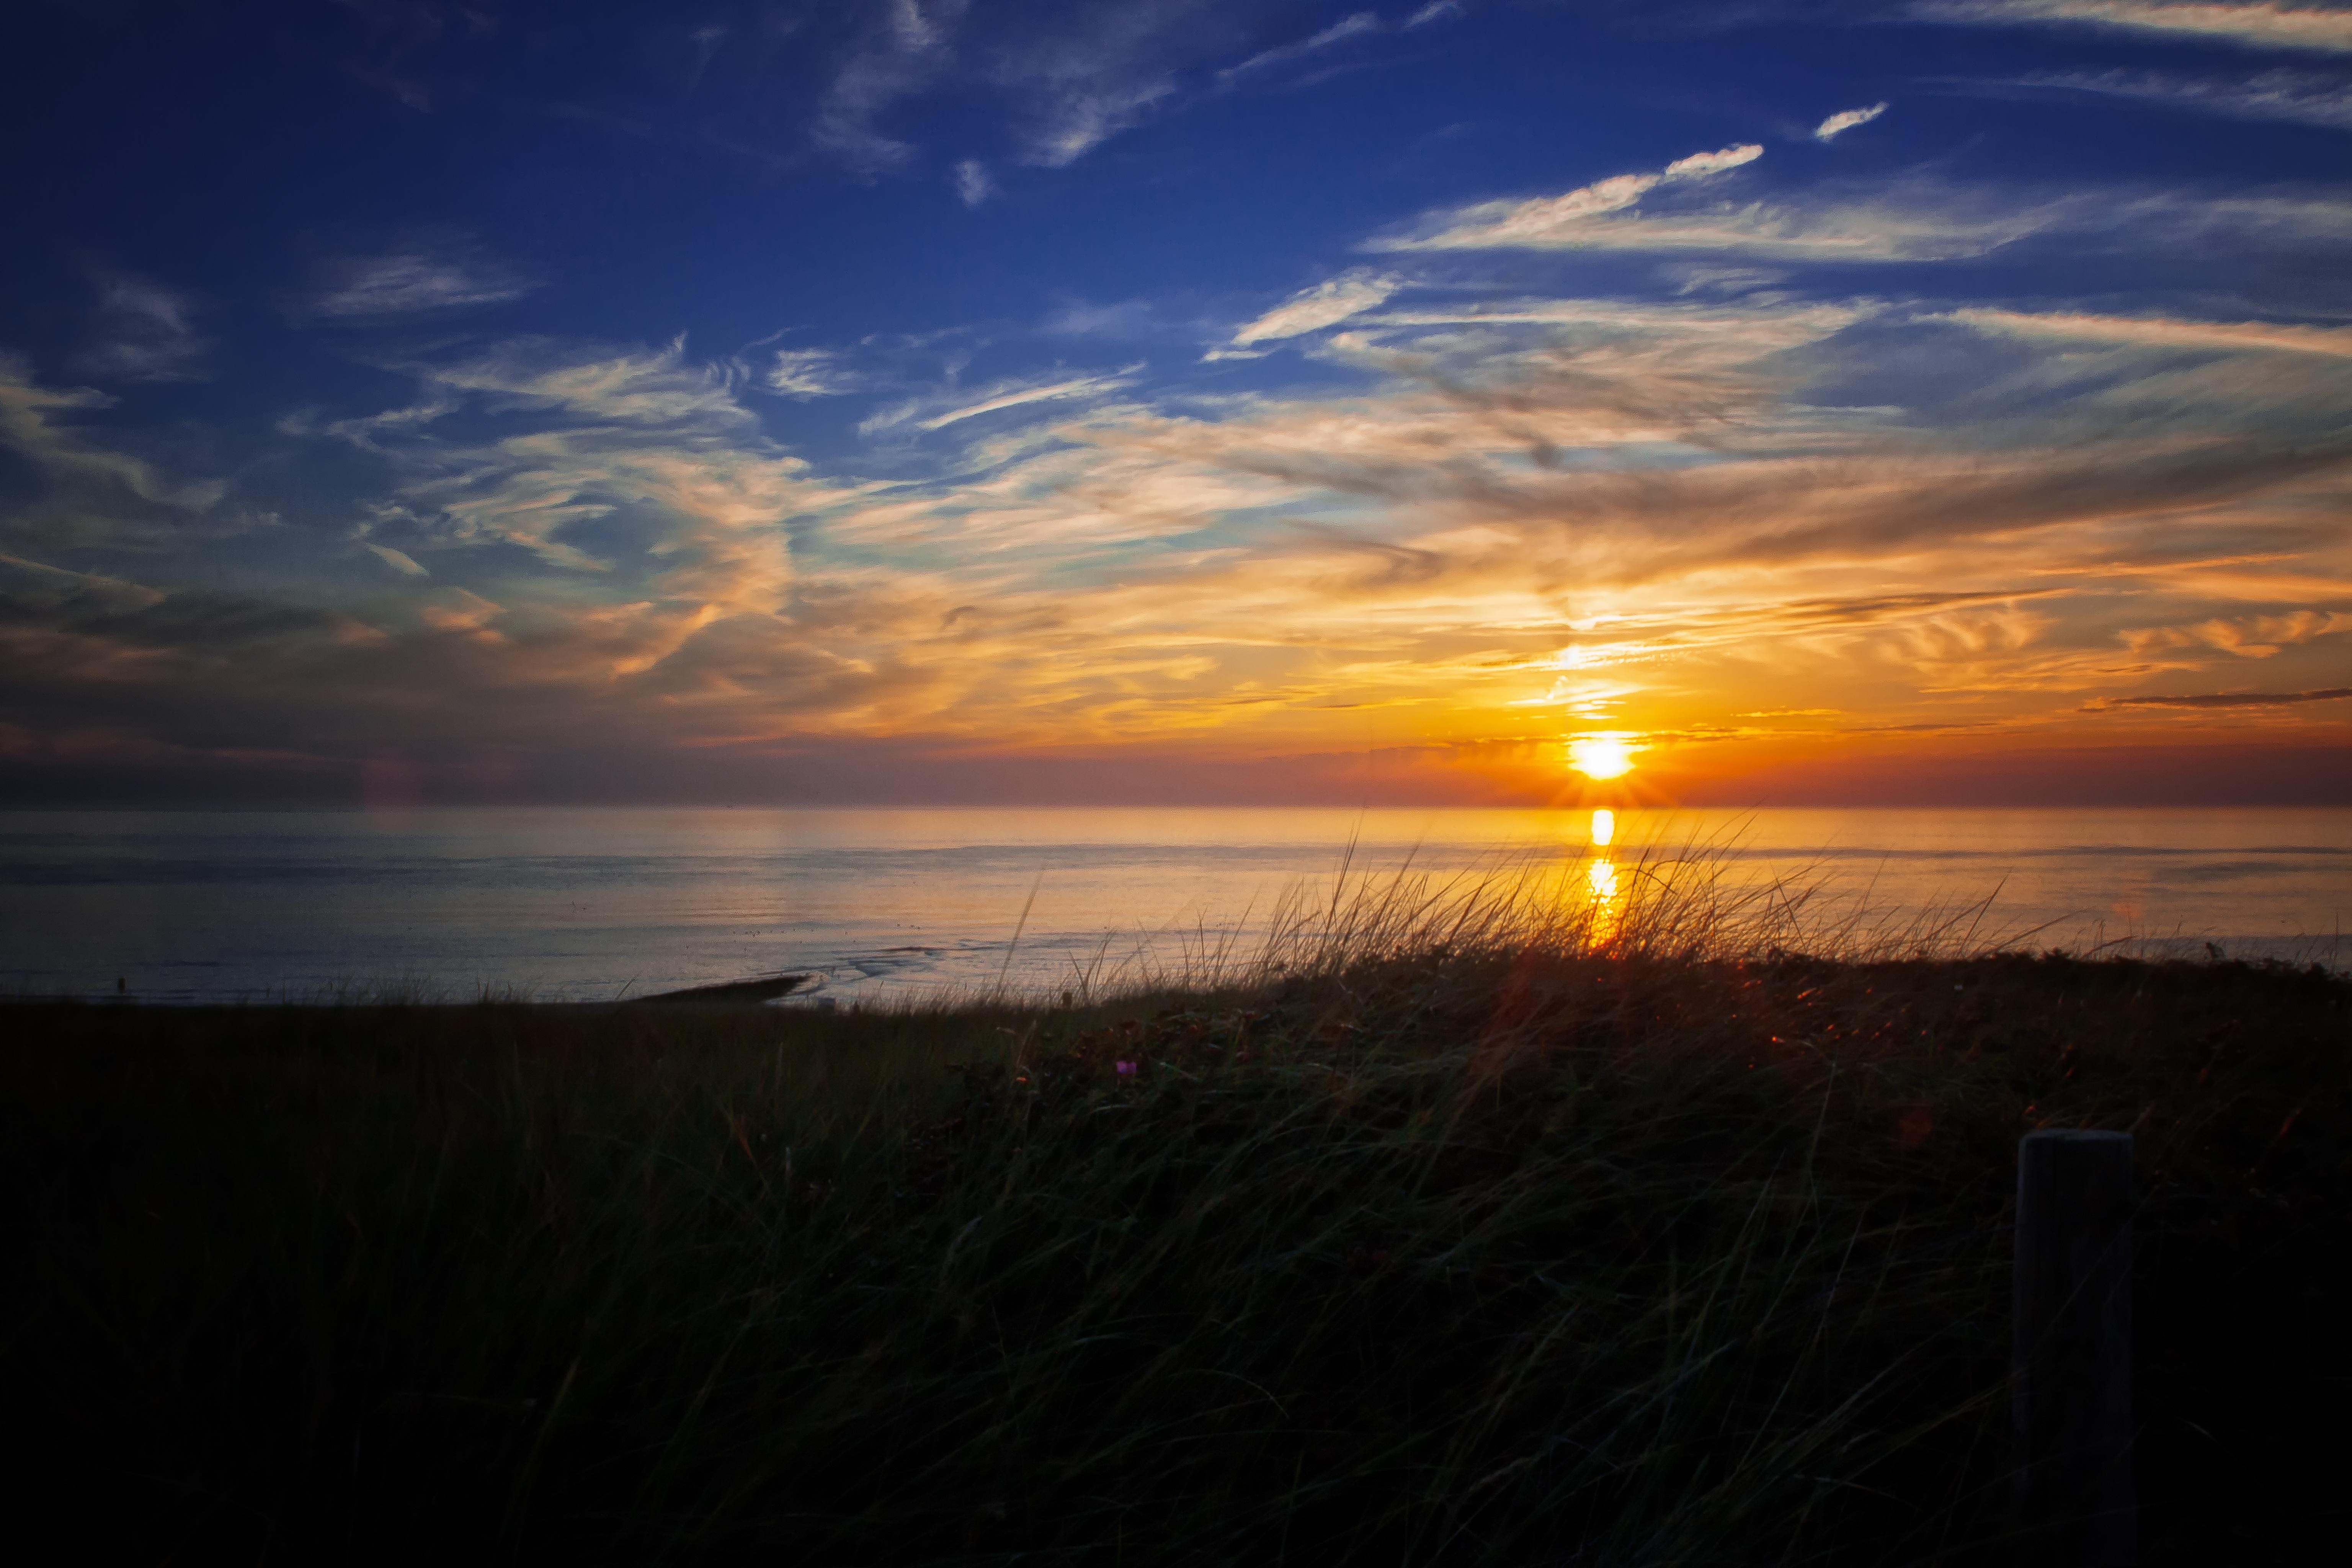 Kostenlose foto : Landschaft, Meer, Wasser, Natur ...